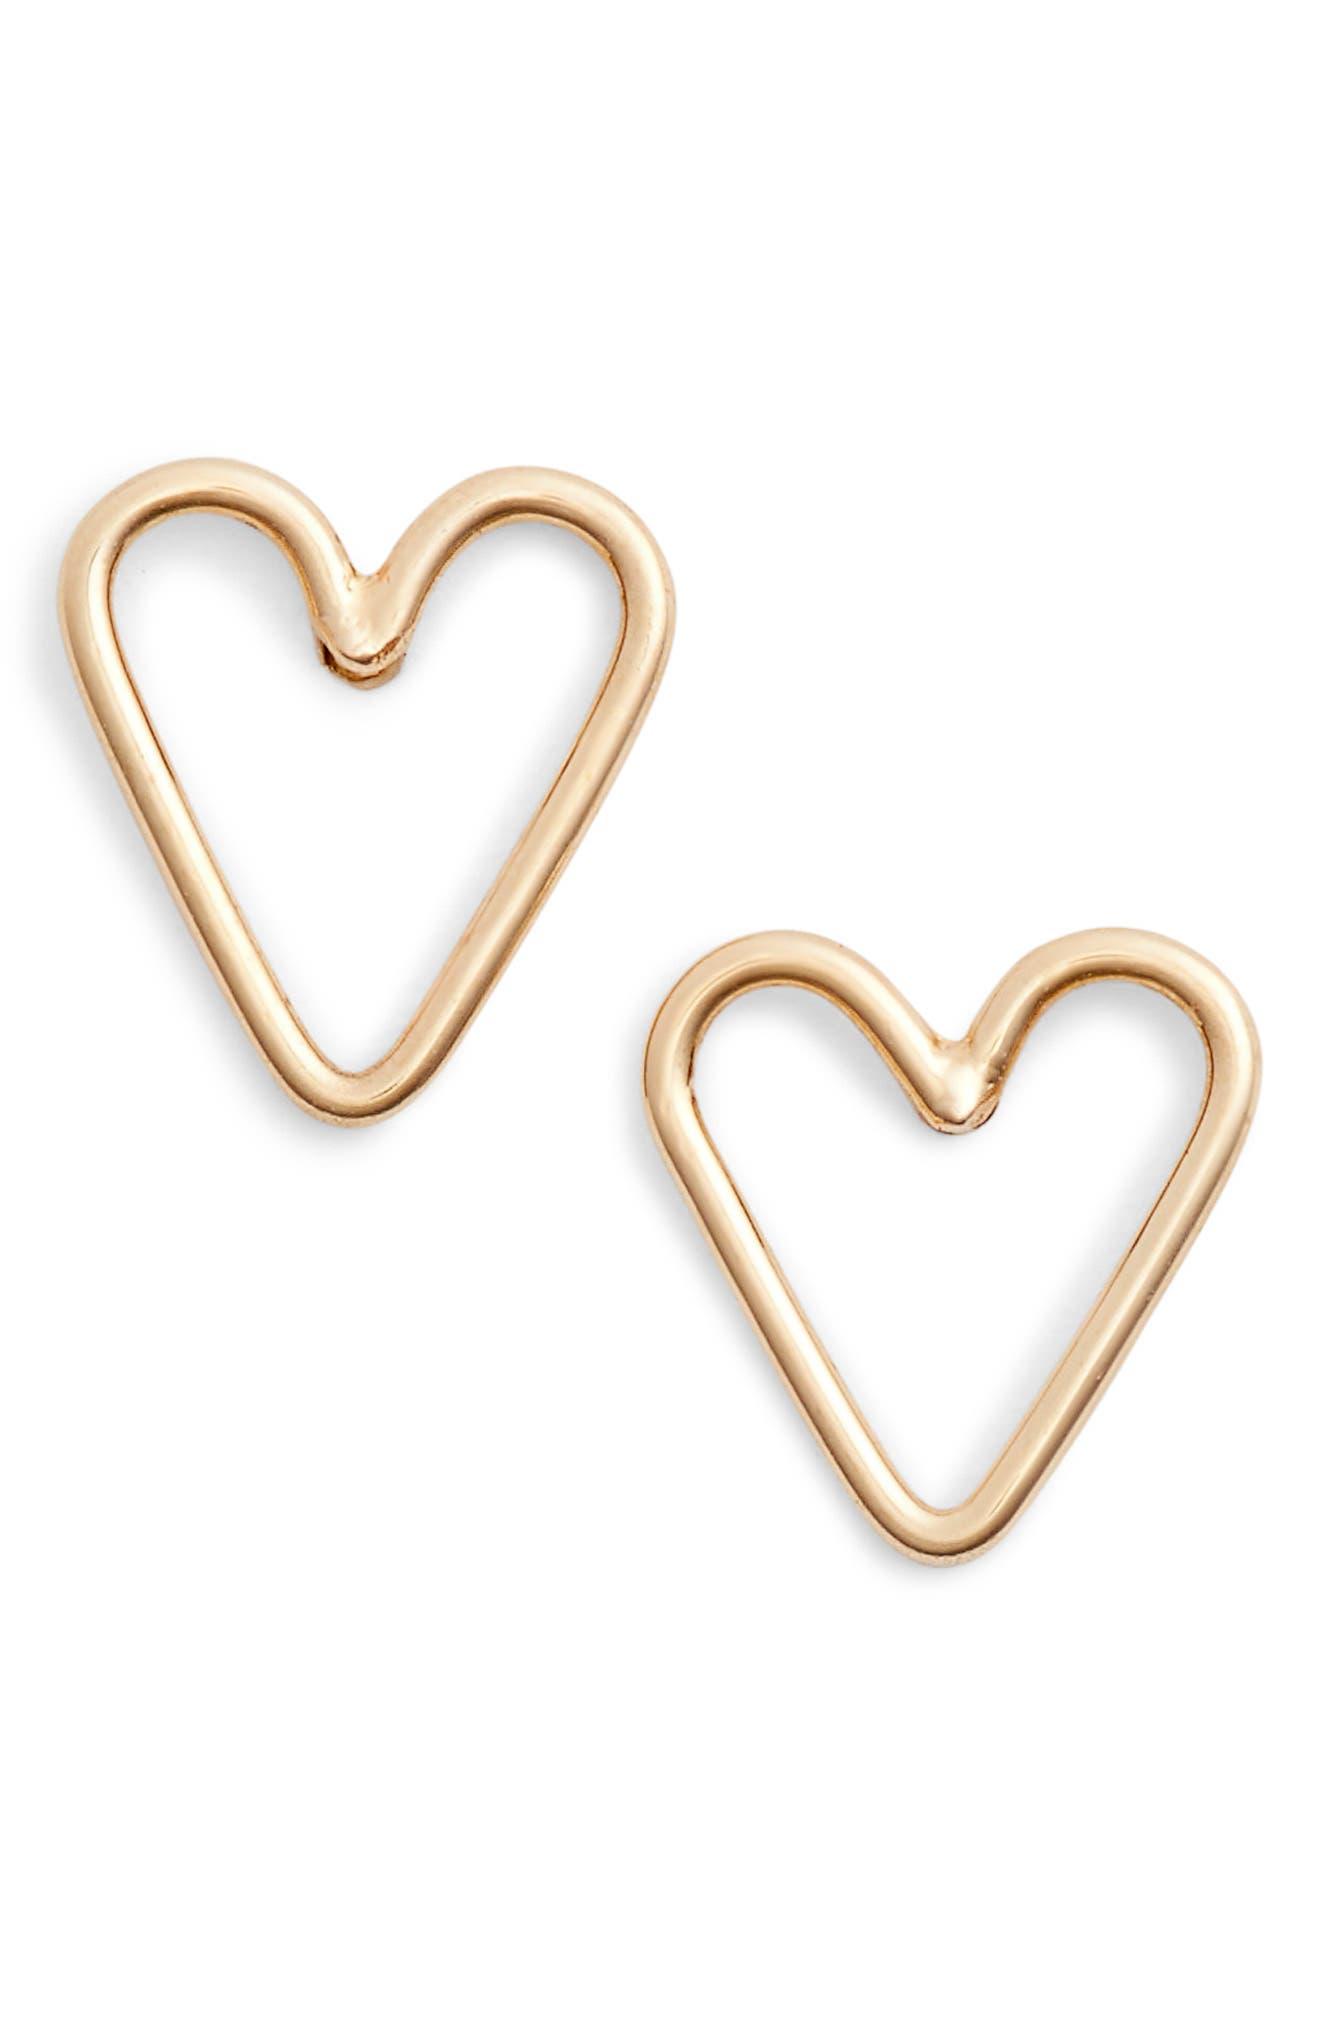 Alternate Image 1 Selected - Zoë Chicco Open Heart Stud Earrings